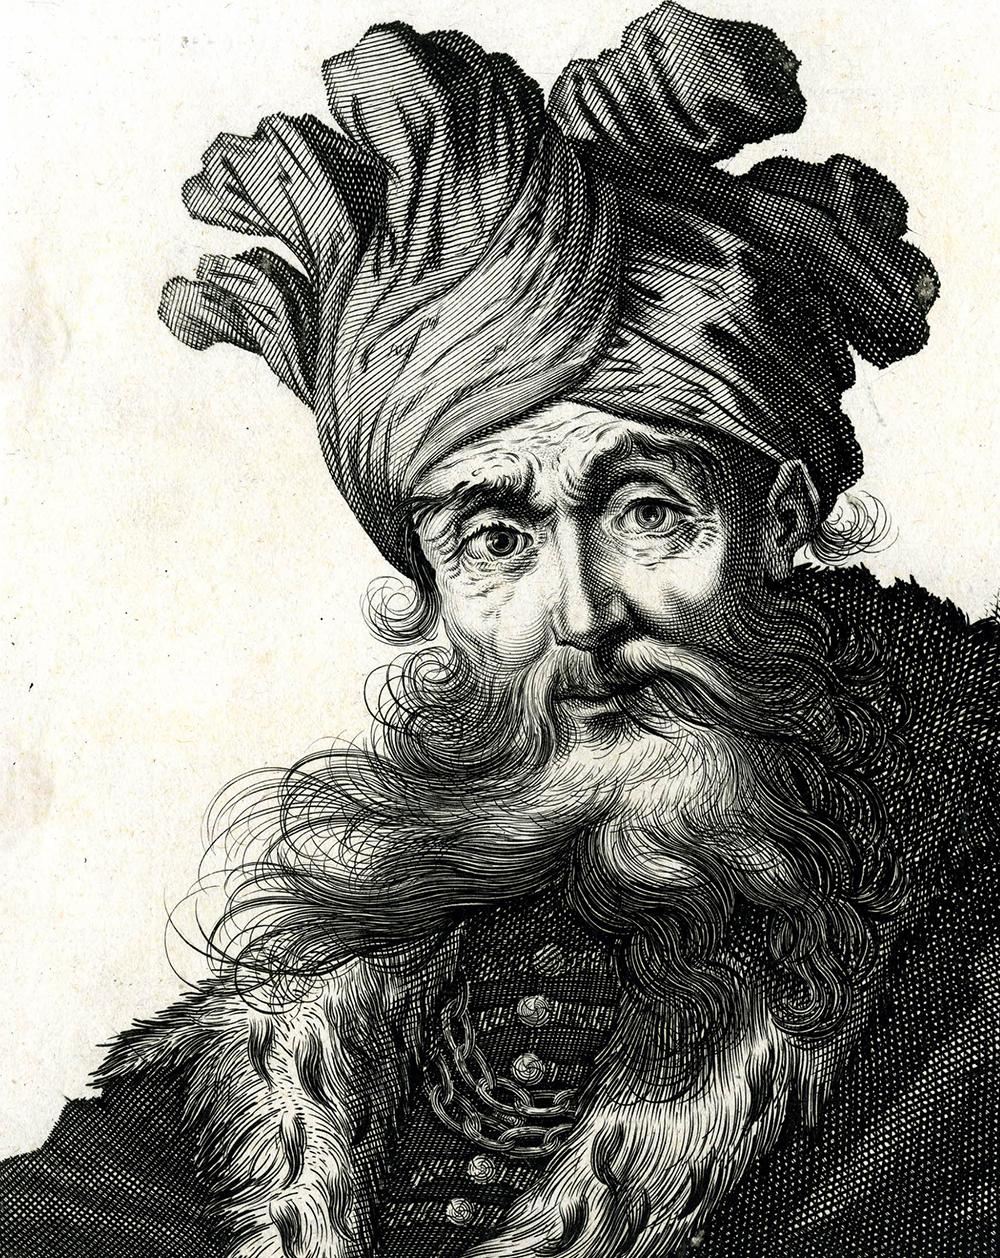 Saladinus Sultanus, by Jérôme David and Claude Vignon, c. 1610. The British Museum.